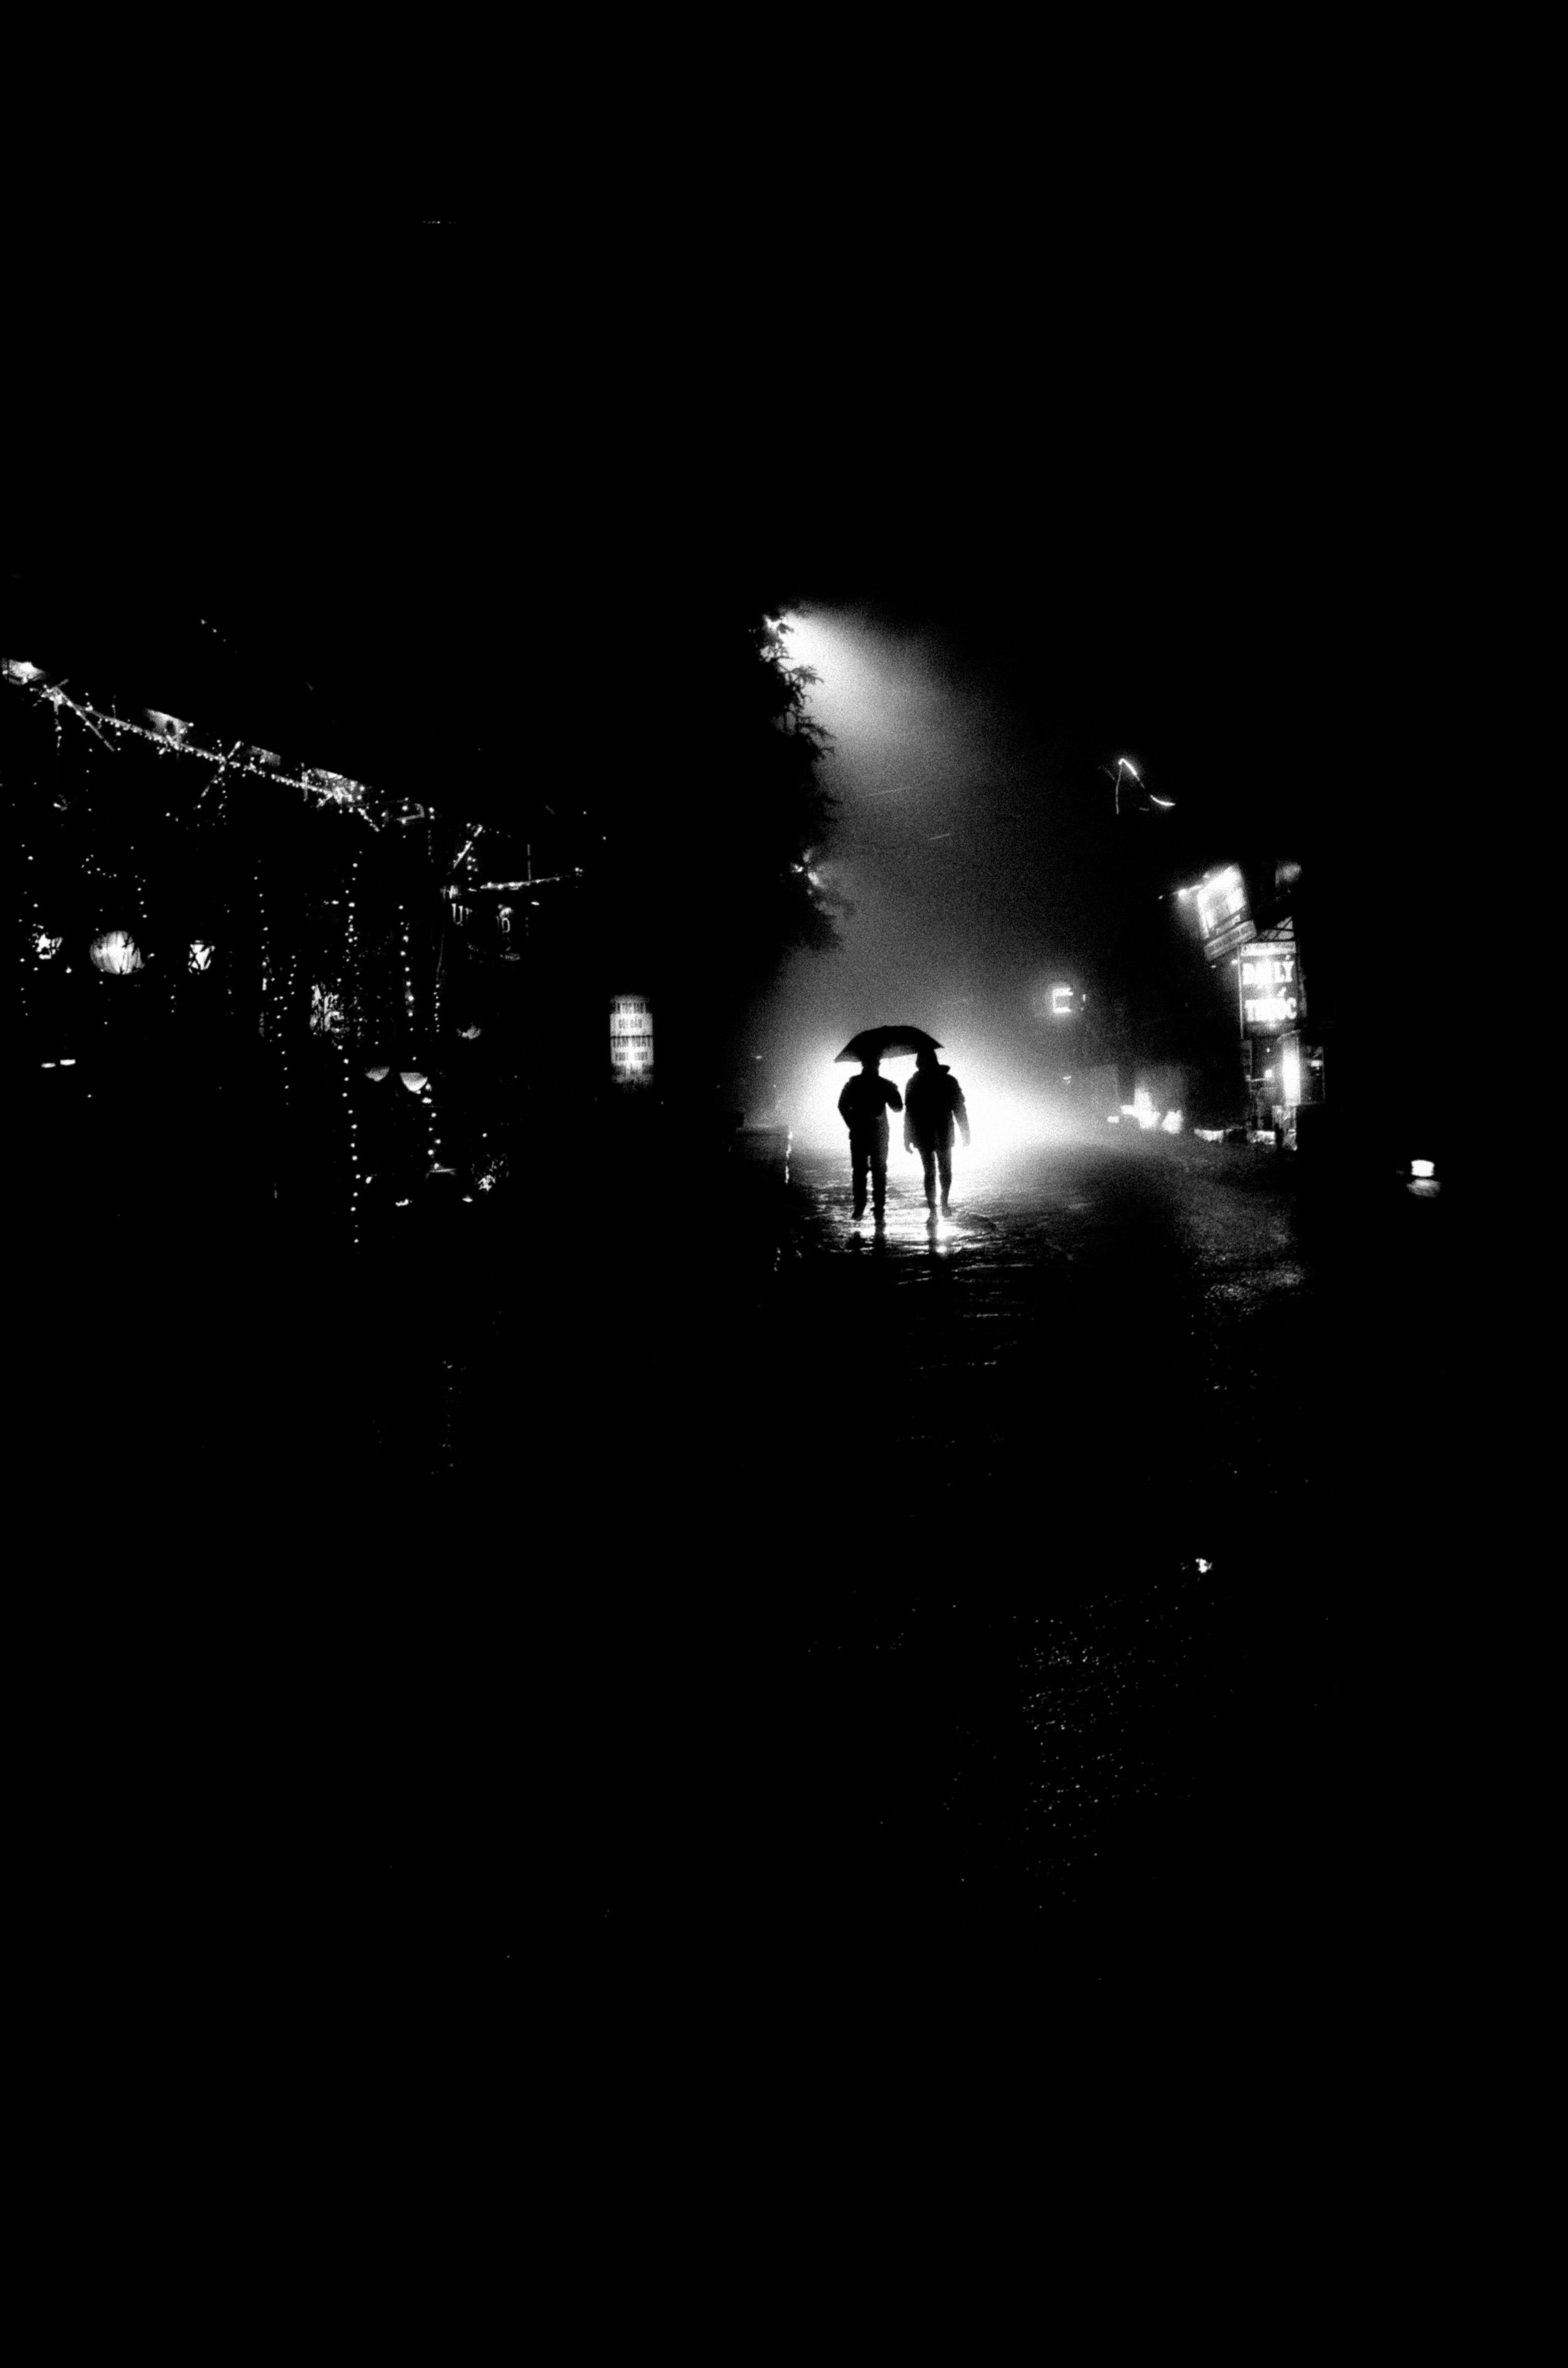 eric kim street photography -sapa-0006078.jpg